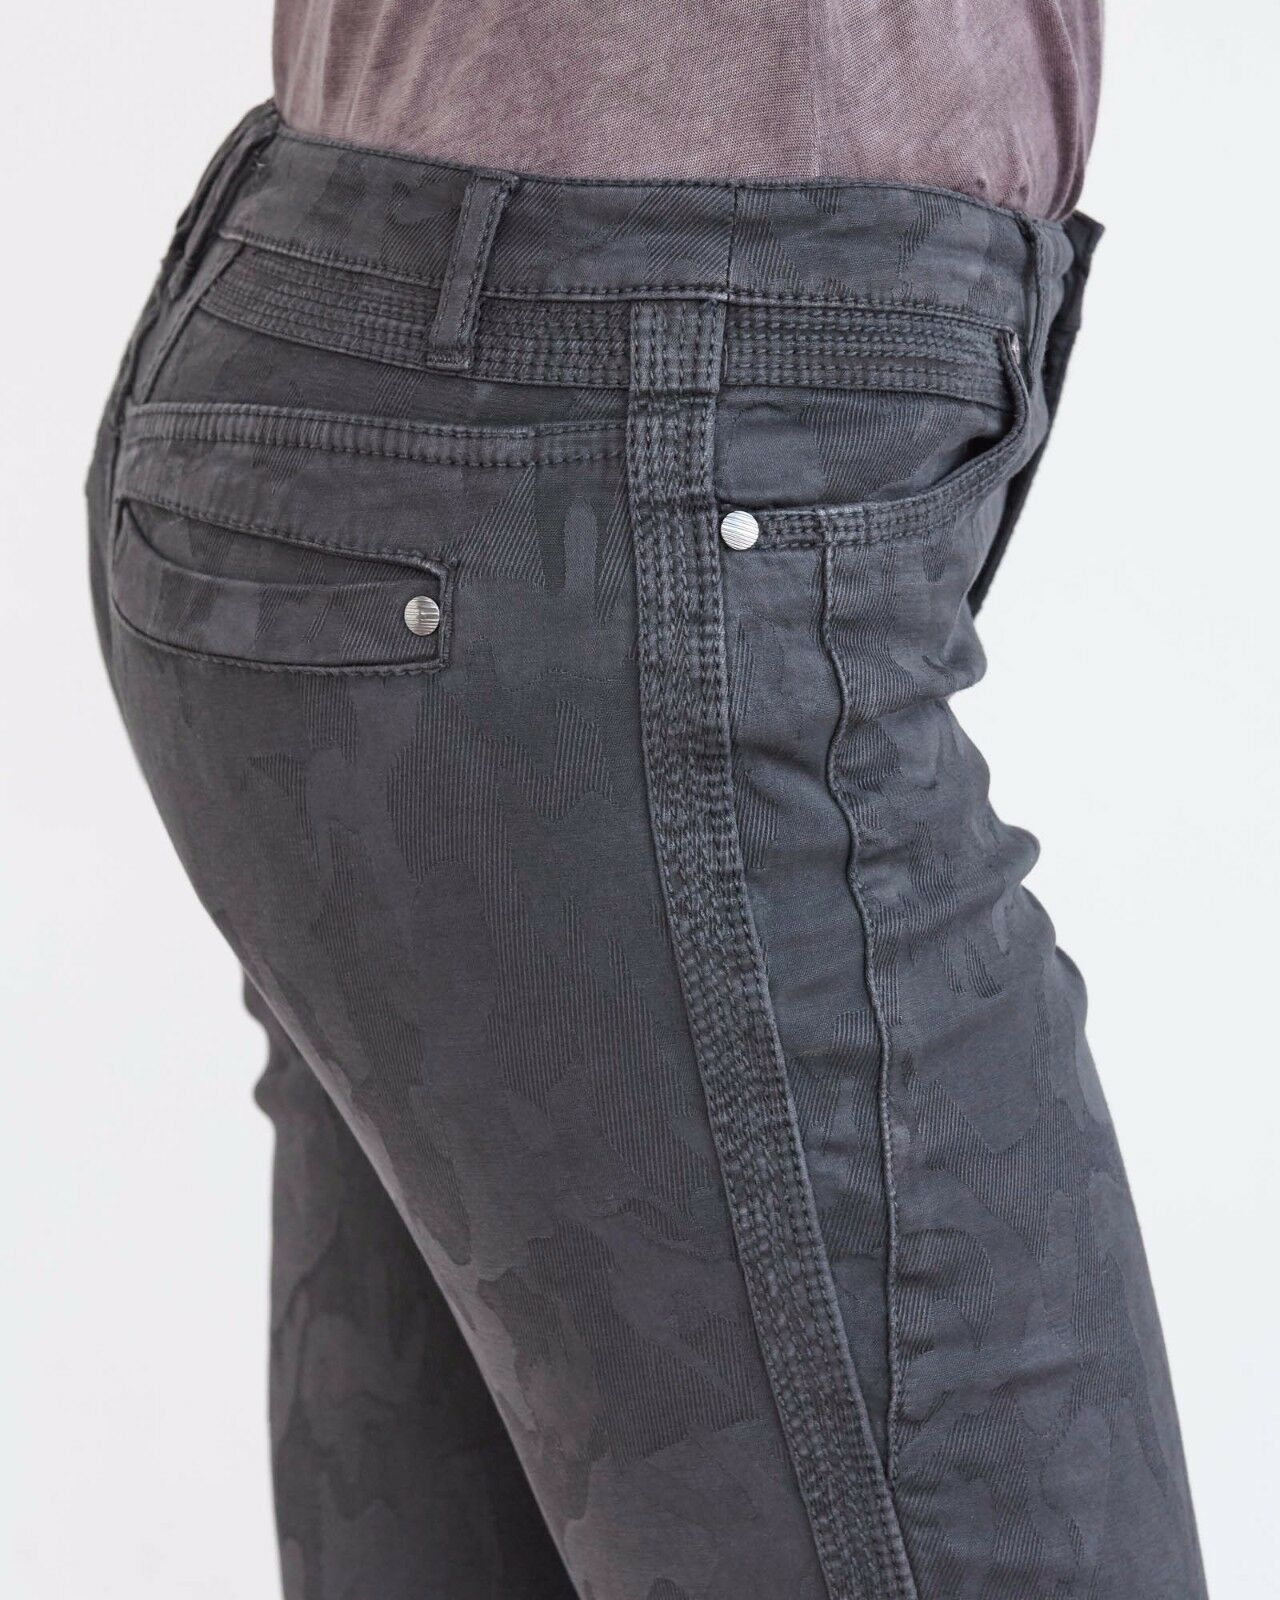 NWT MARRAKECH Size 25 Slim Jacquard Camo Pant Graphite